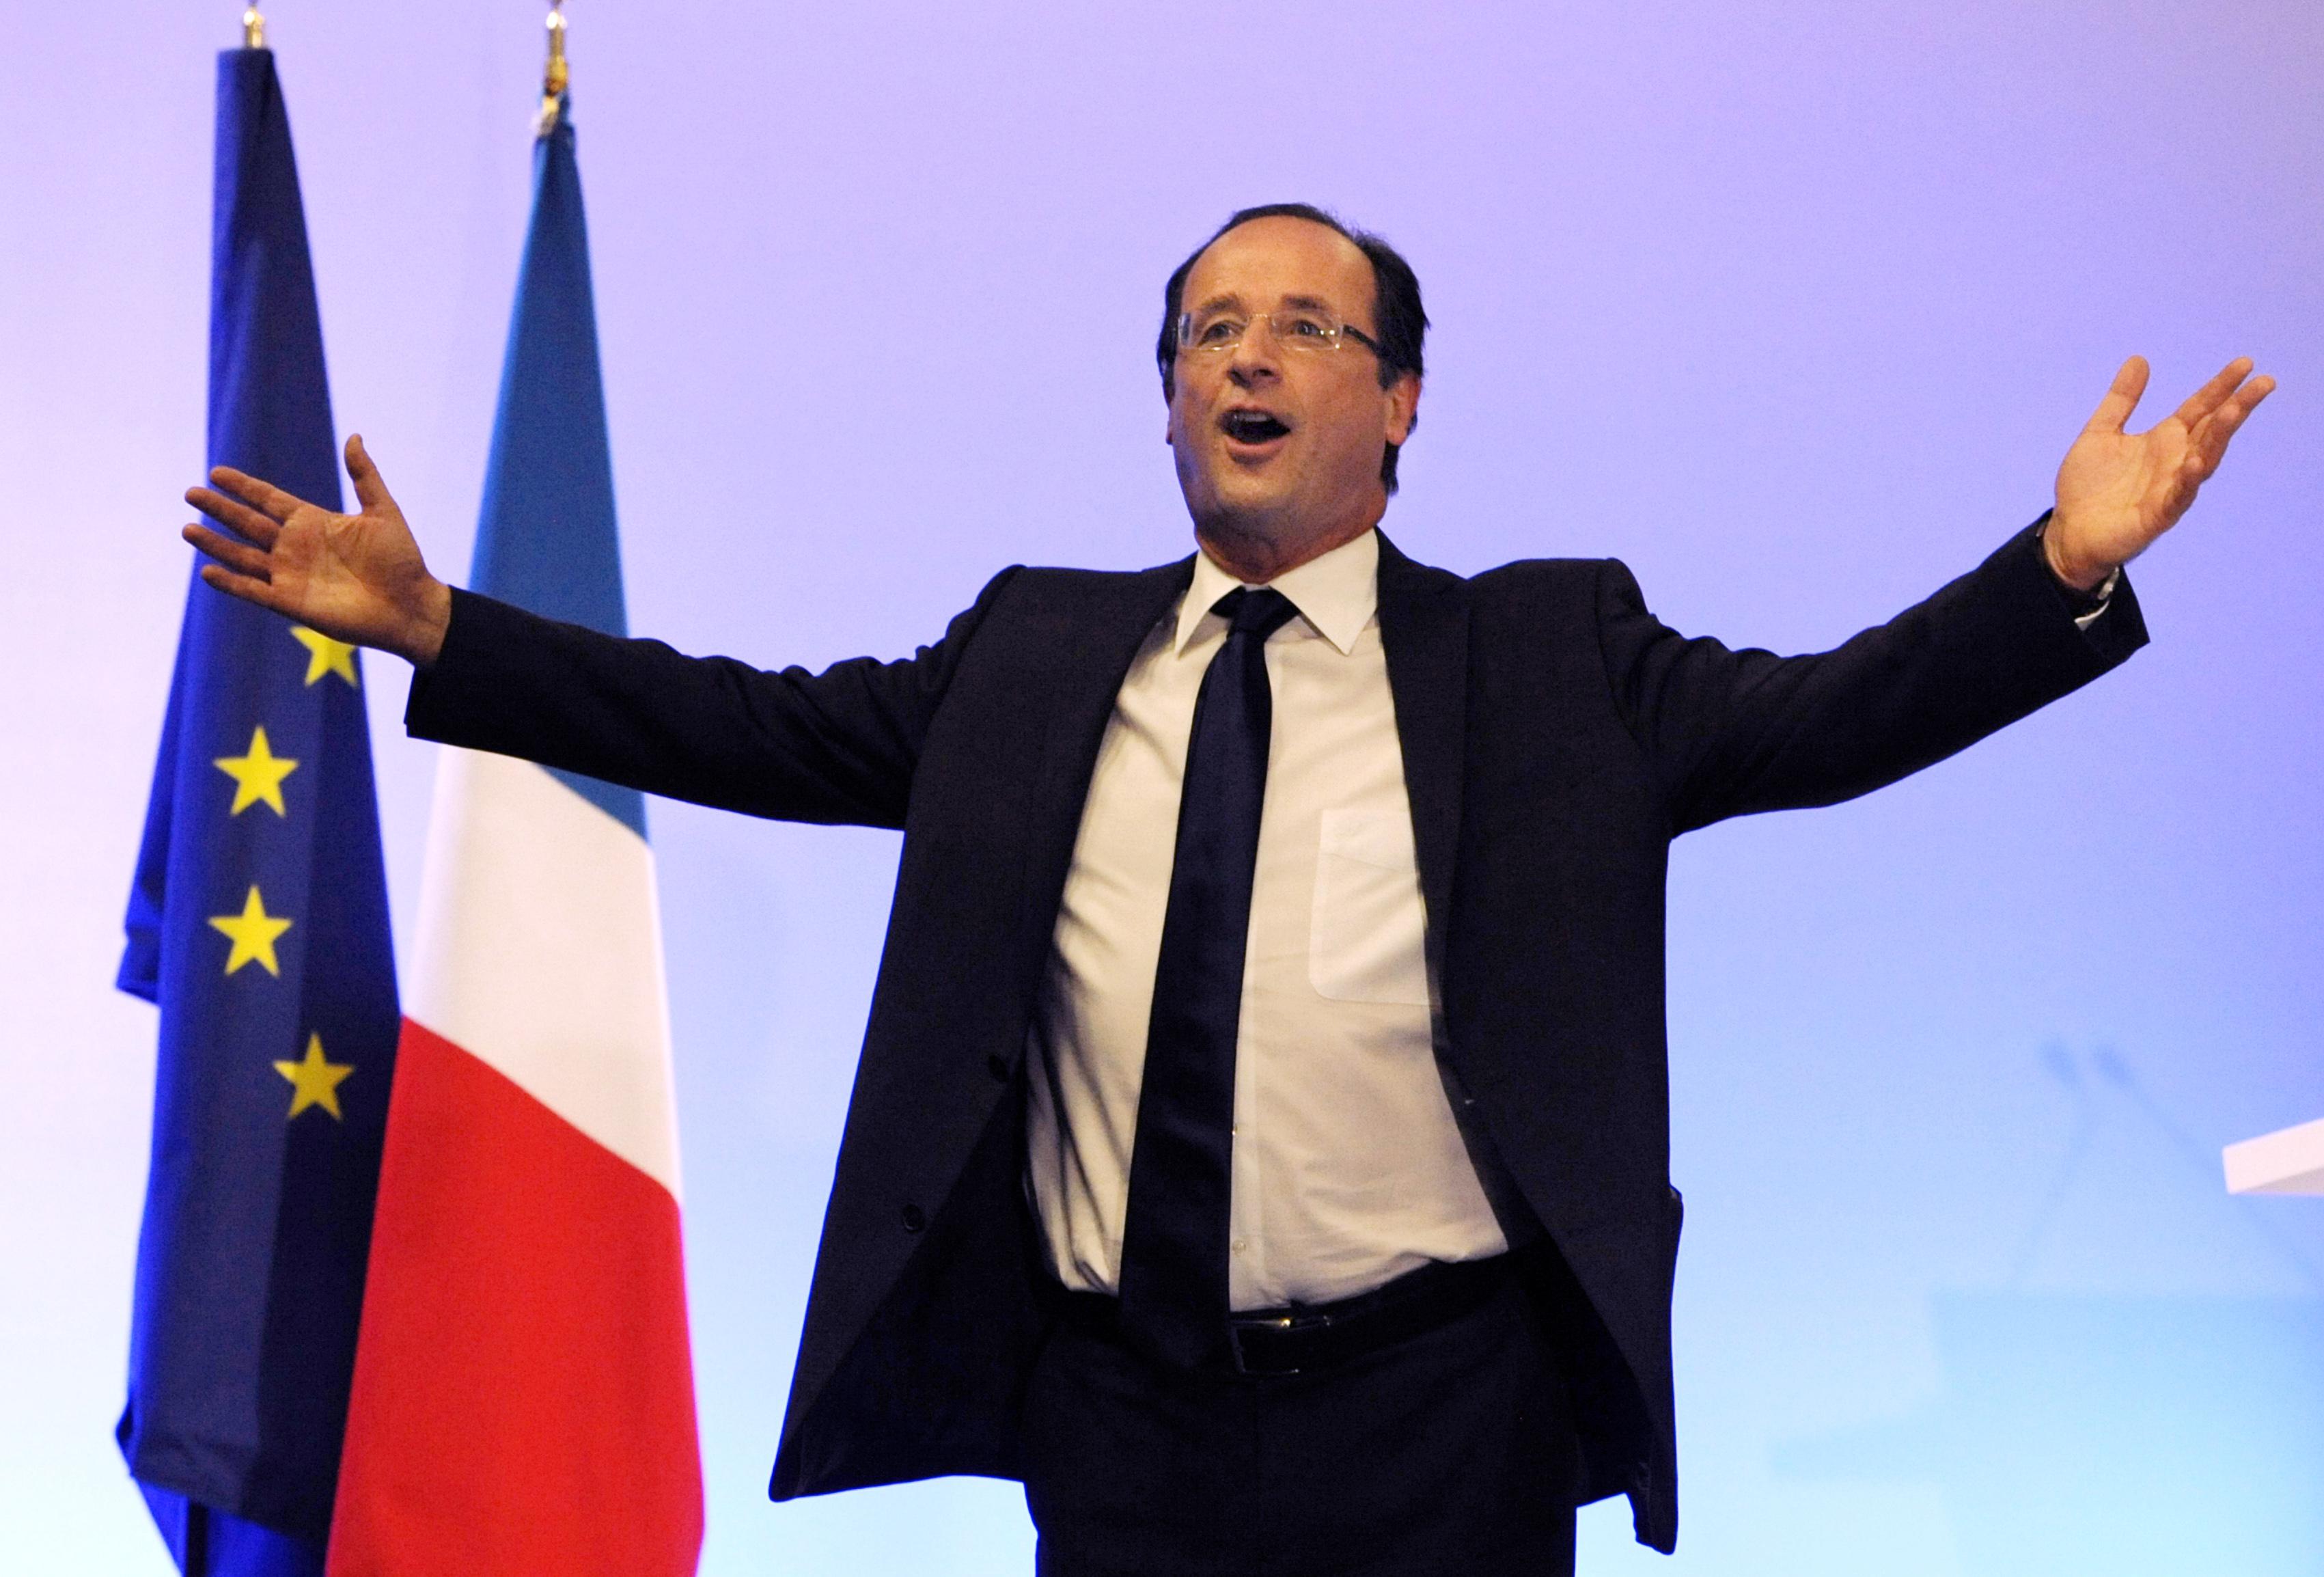 Verkiezingen Frankrijk Francois Hollande